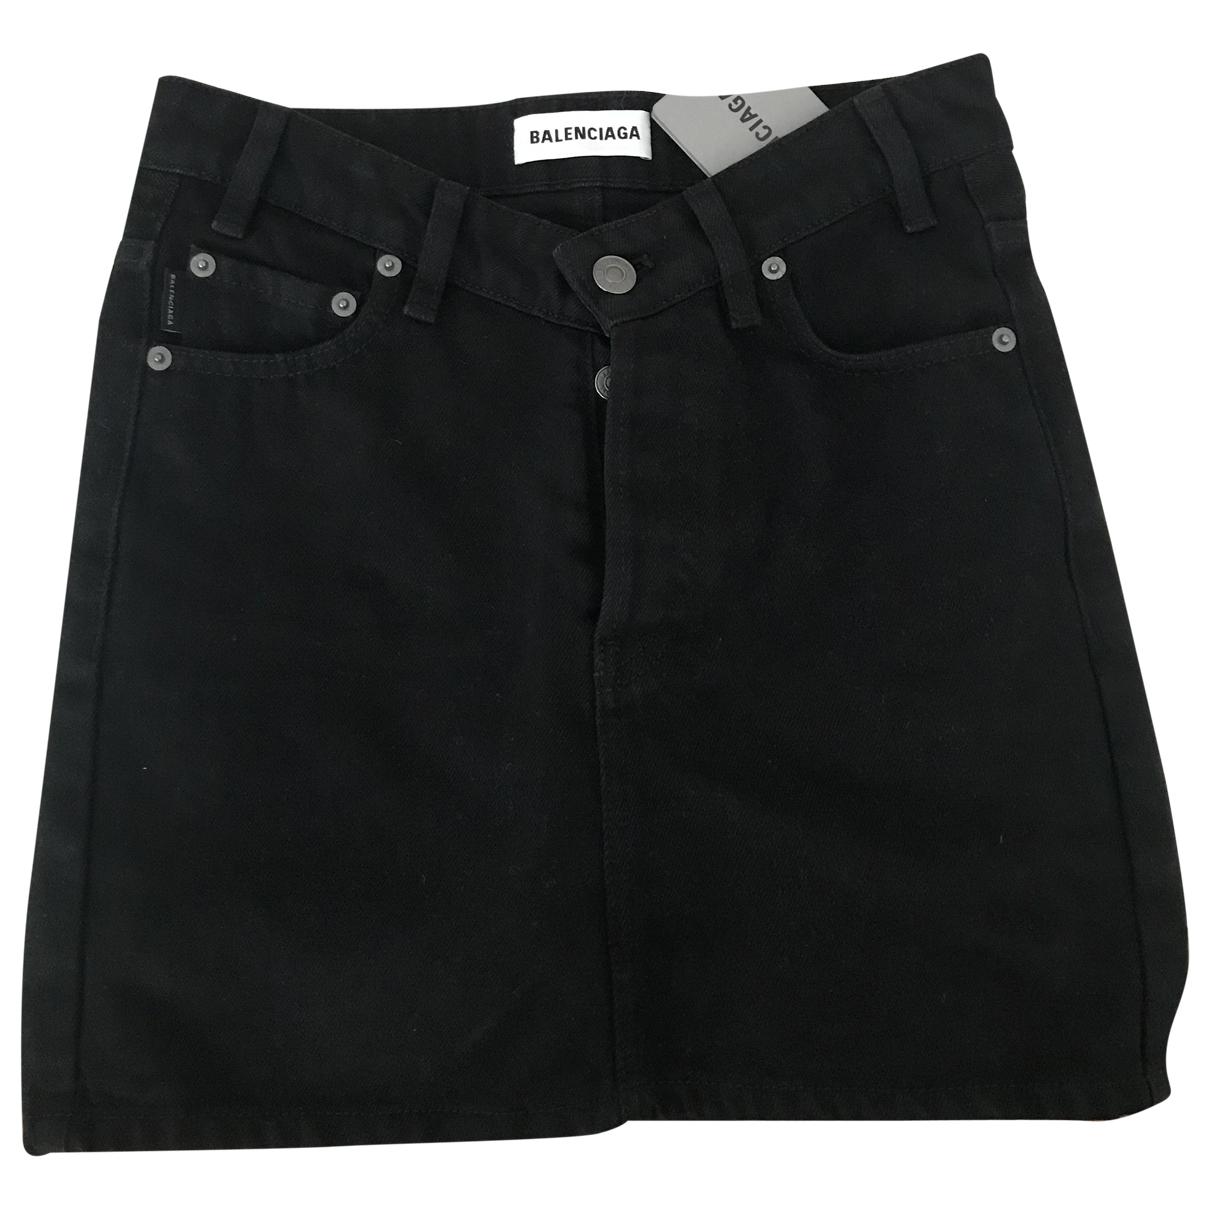 Balenciaga - Jupe   pour femme en denim - noir